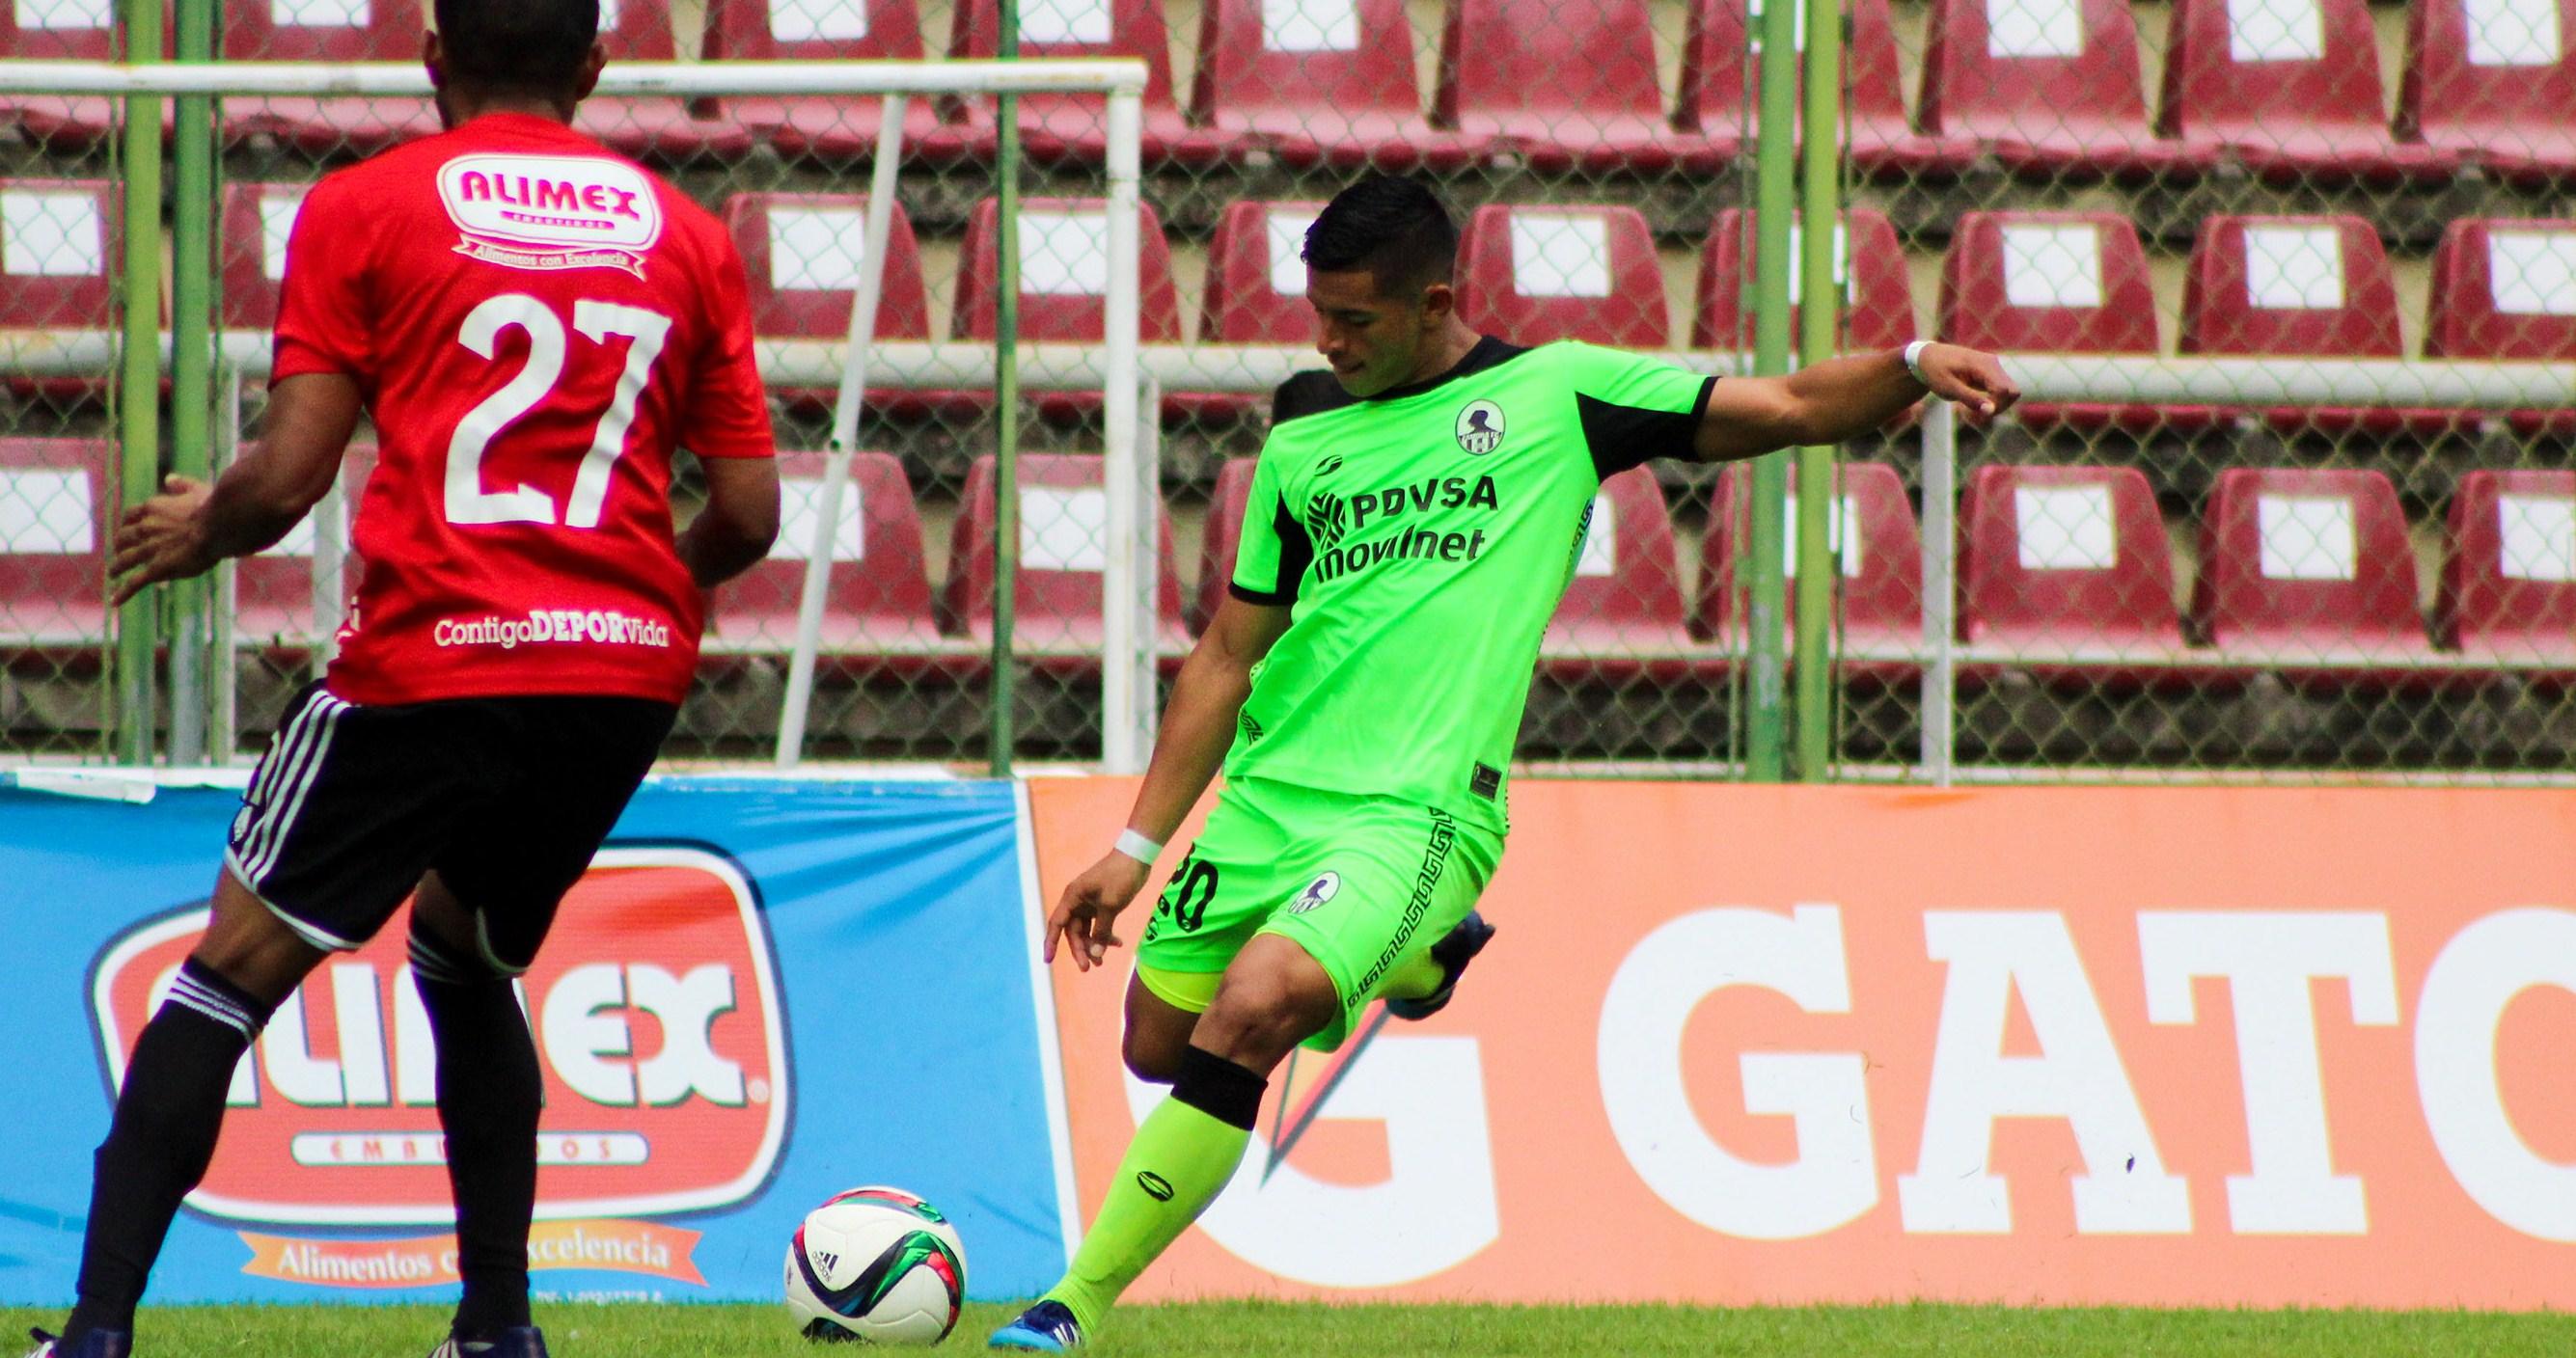 Ronald-Hernández_vs_Dvo-Lara_CV16